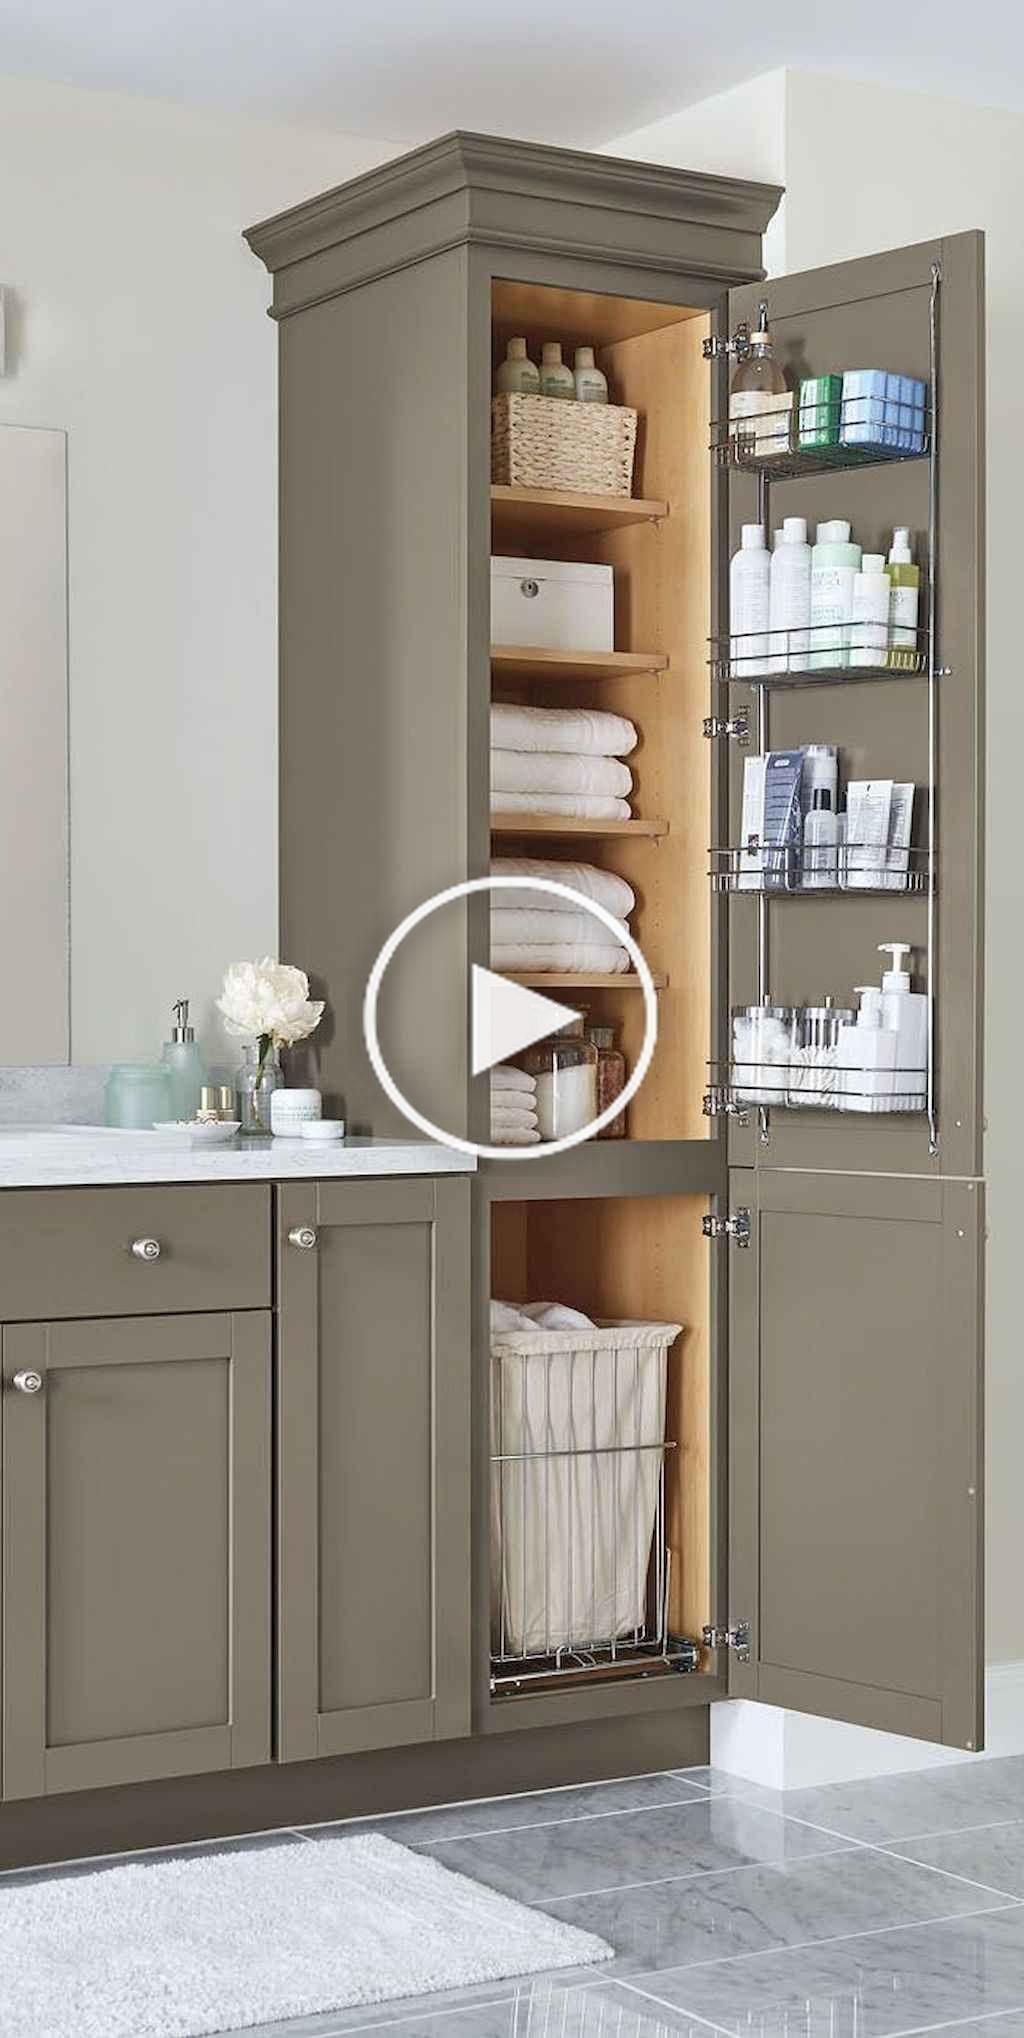 80 Clever Diy Badezimmer Speicherorganisation Ideen In 2020 Bathrooms Remodel Diy Bathroom Remodel Small Bathroom Remodel